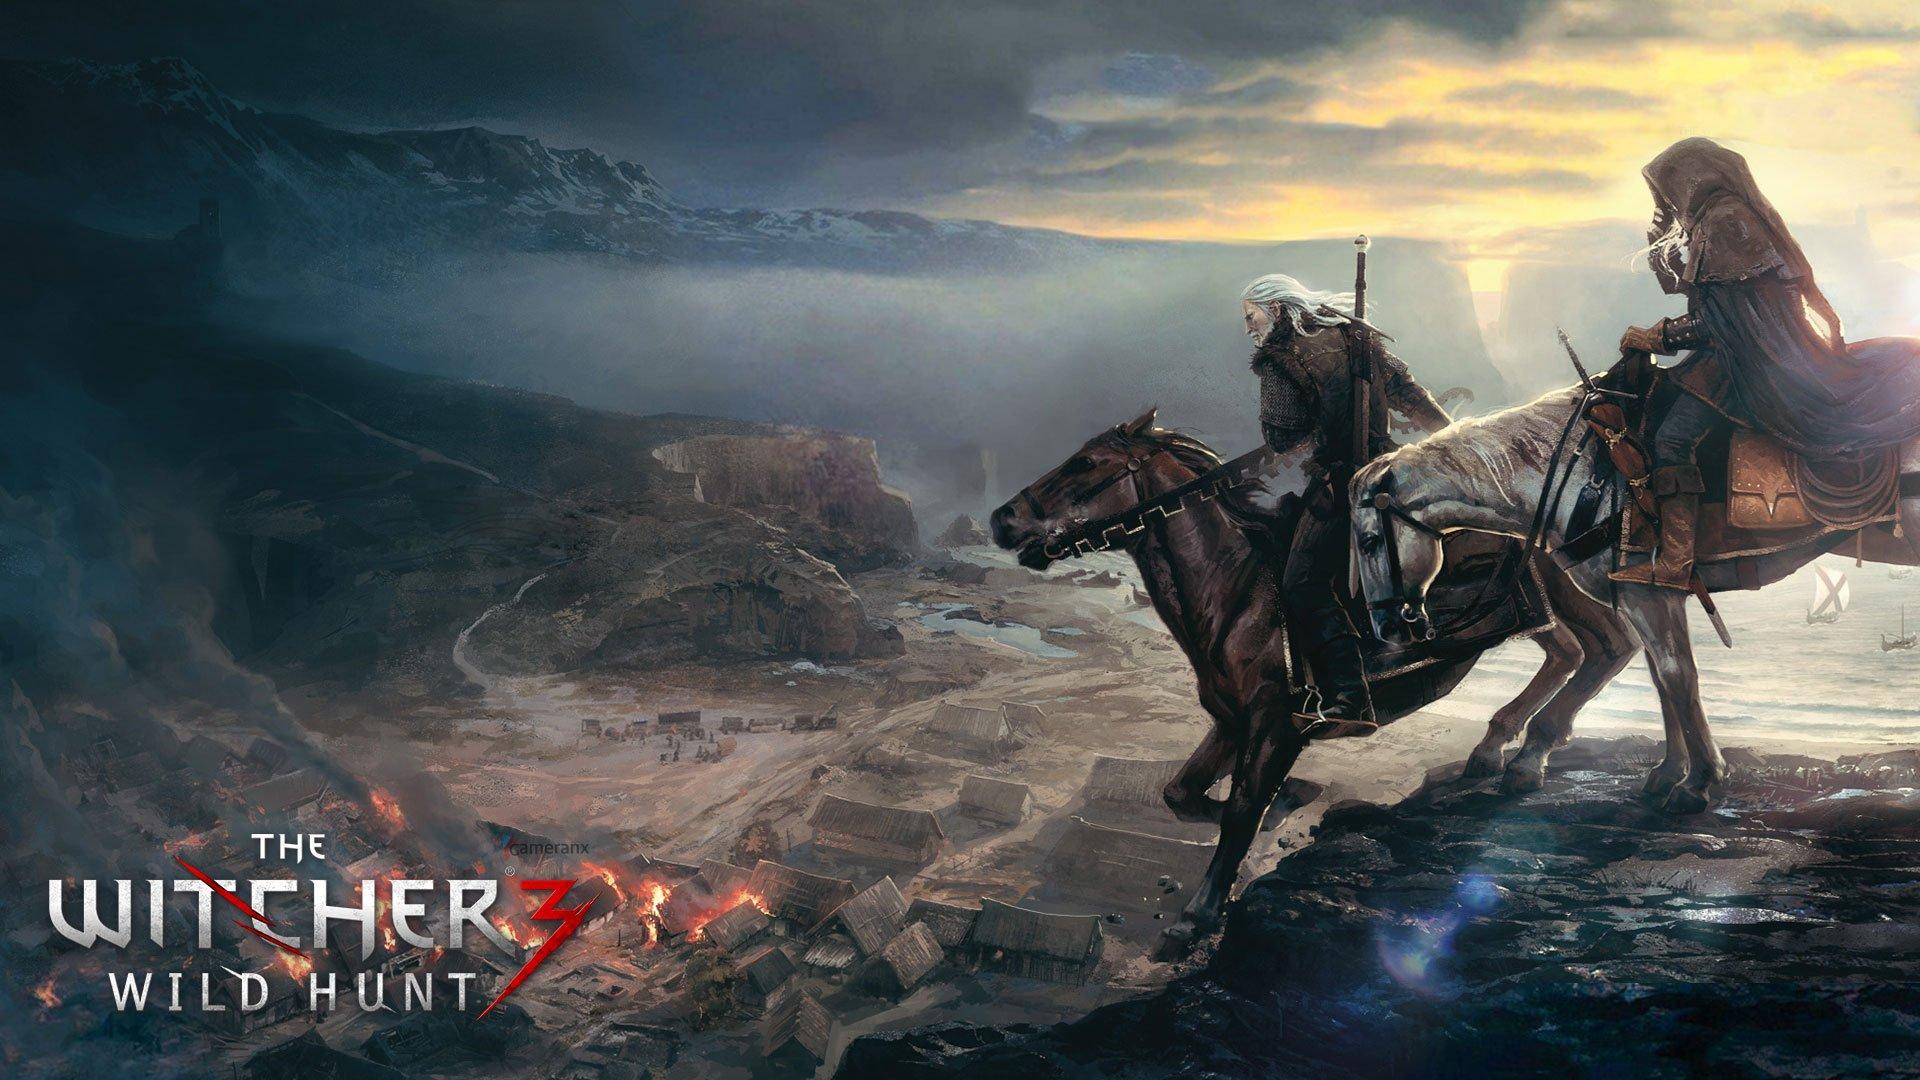 The Witcher 3 Image download in digitalimagemakerworldcom 1920x1080